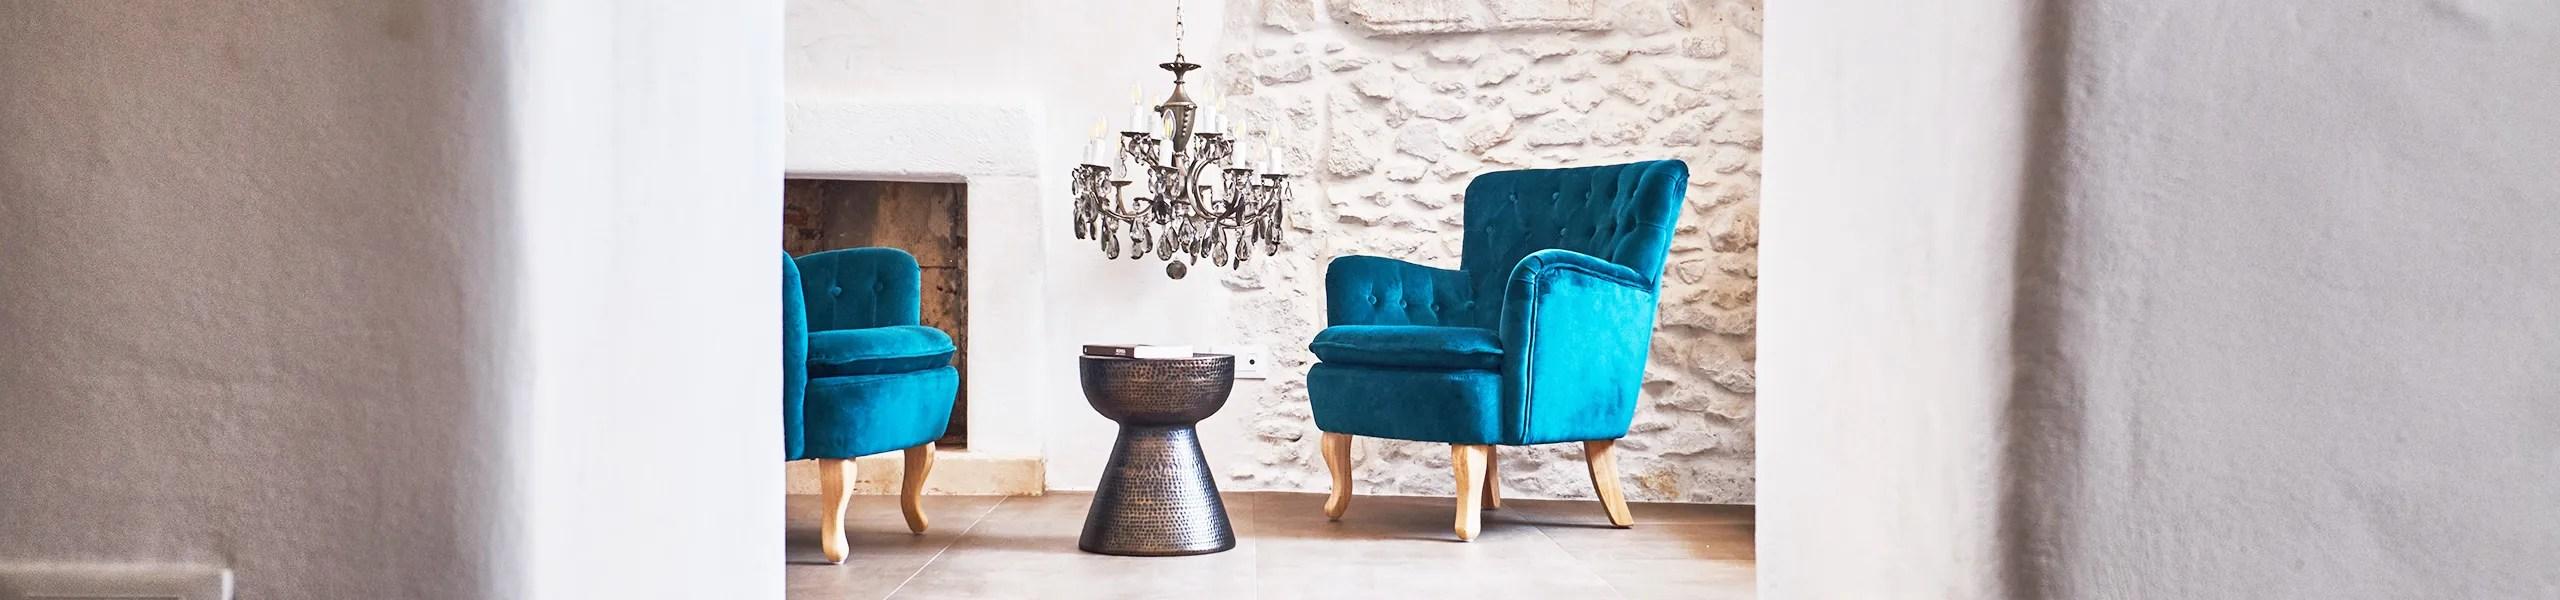 La Porta Blu by BeeYond Travel Luxury Apartment Puglia